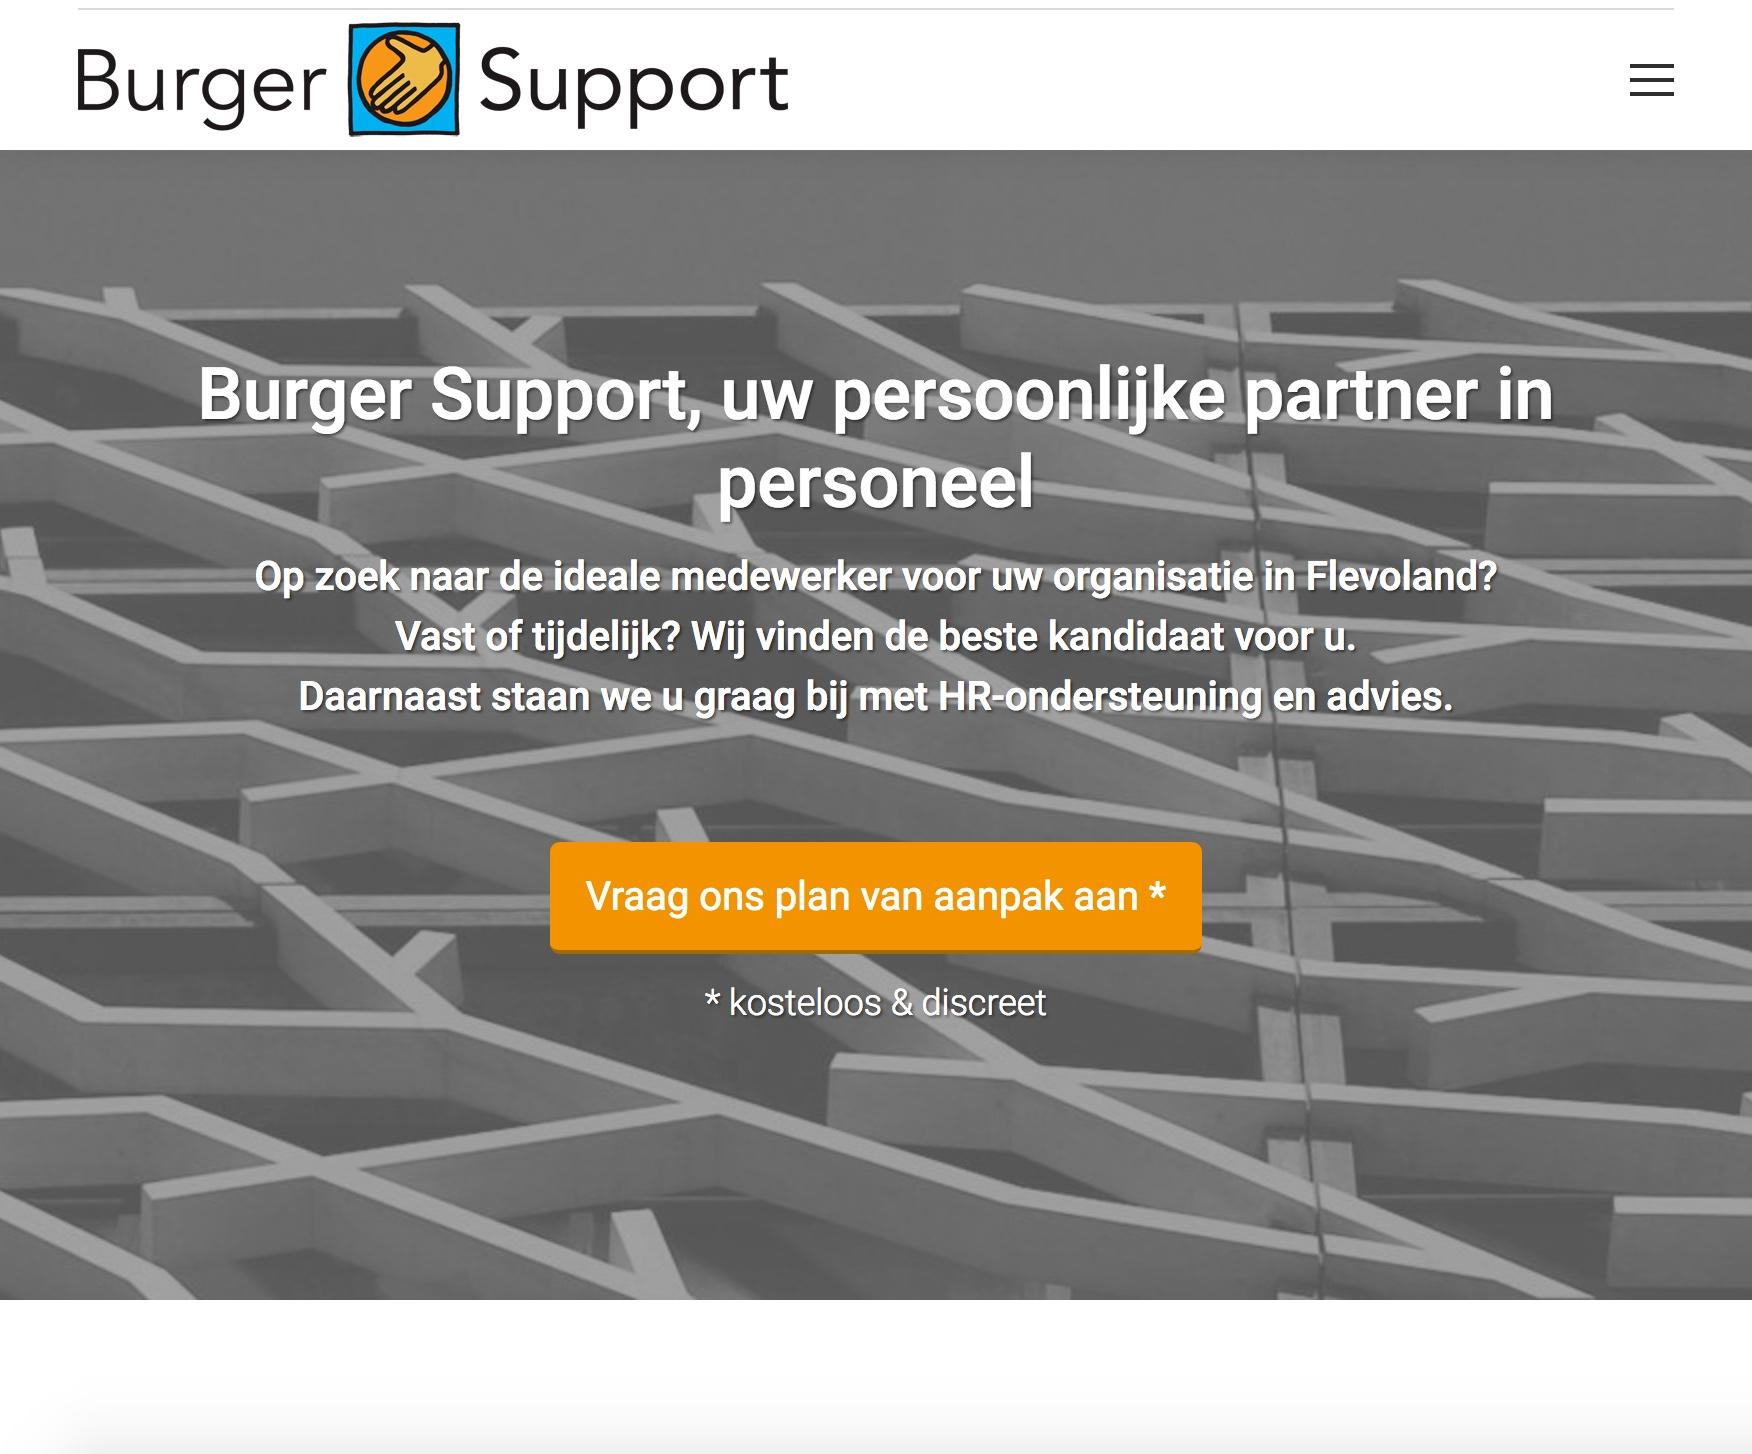 burgersupport.jpg